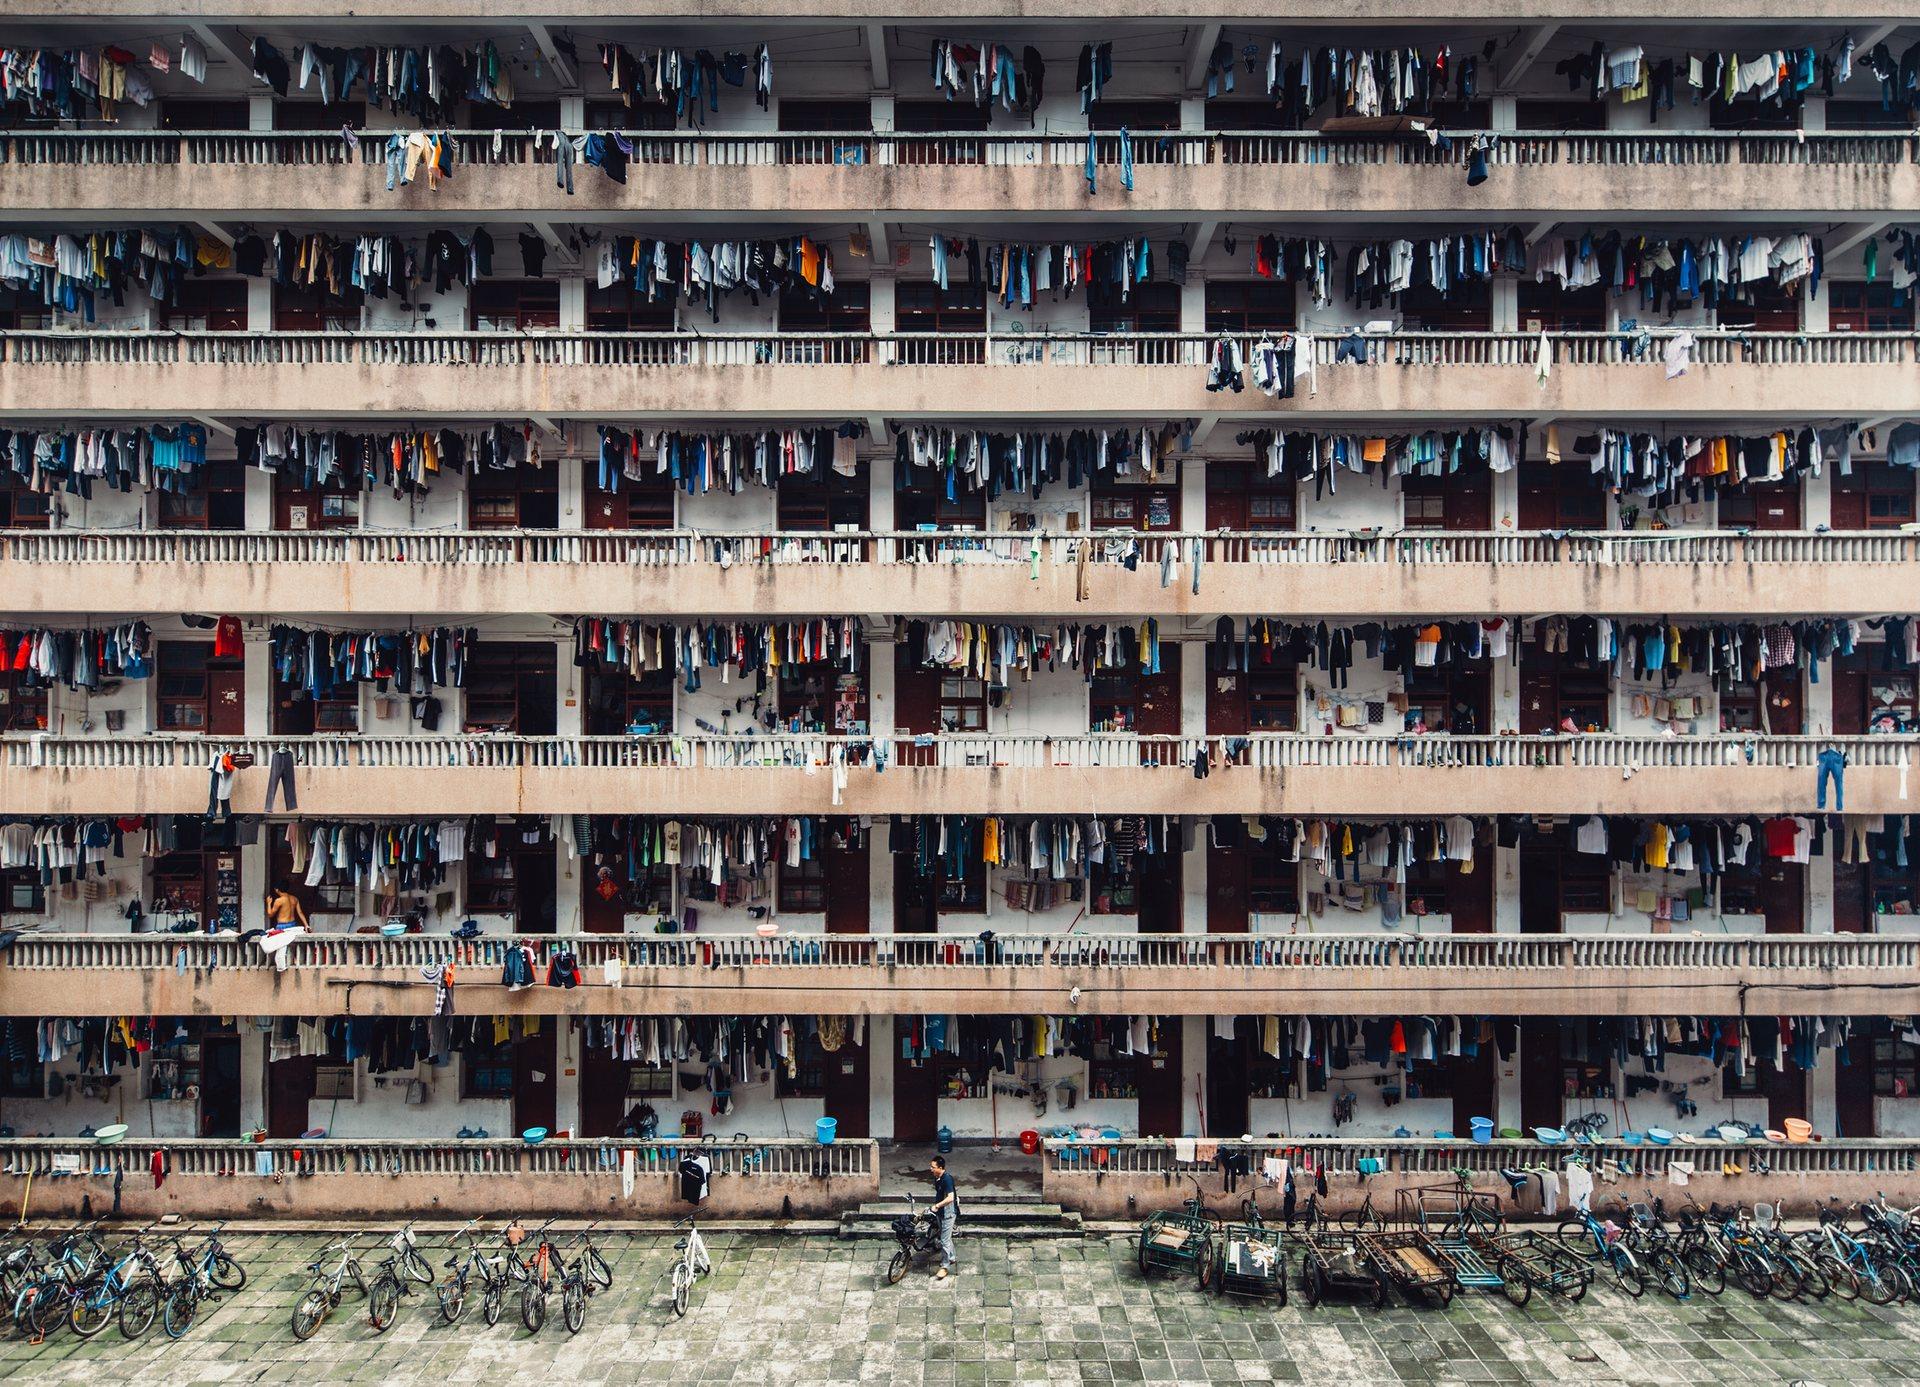 Silenced: Αυτή η φωτογραφία έχει ληφθεί από το τελευταίο μου ταξίδι στο Guang Zhou, στην Κίνα. Αυτό το μέρος είναι ένα σχολείο με κοιτώνες του South China Normal University. Όσο τριγυρνούσα, οι περισσότεροι έκαναν διάλειμμα. Μετά το μεσημεριανό, θα πρέπει να επιστρέψουν για μελέτη. Οι κοιτώνες ήταν βρώμικοι και δύσοσμοι. Photograph: Wing Ka H./National Geographic Travel Photographer of the Year Contest Πηγή: www.lifo.gr